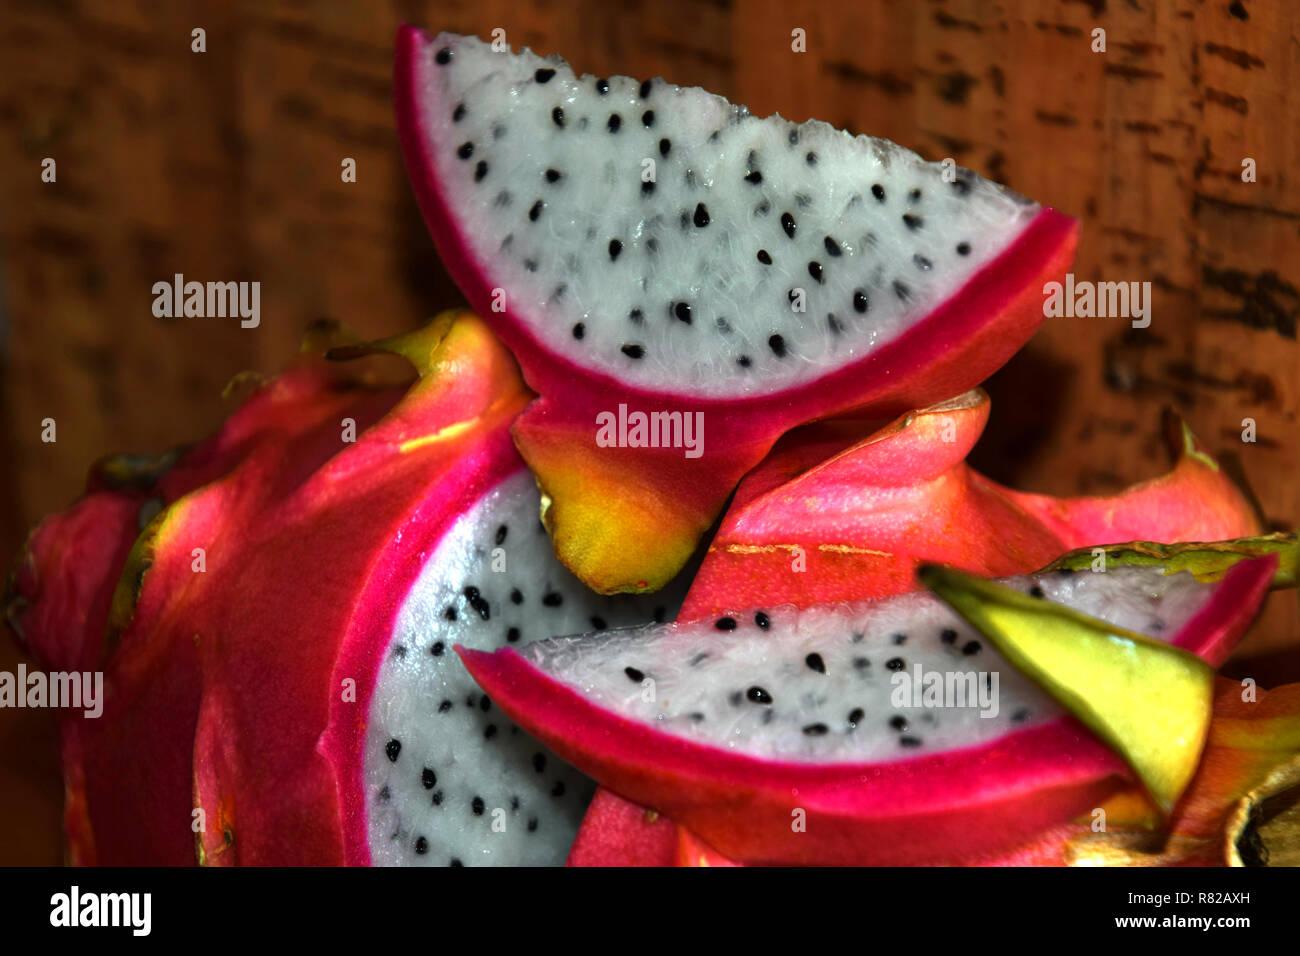 slice of dragon fruit in front of cork background , pitaya blanca or white-fleshed and pink-skinned ripe pitahaya fruit also called hylocereus undatus - Stock Image